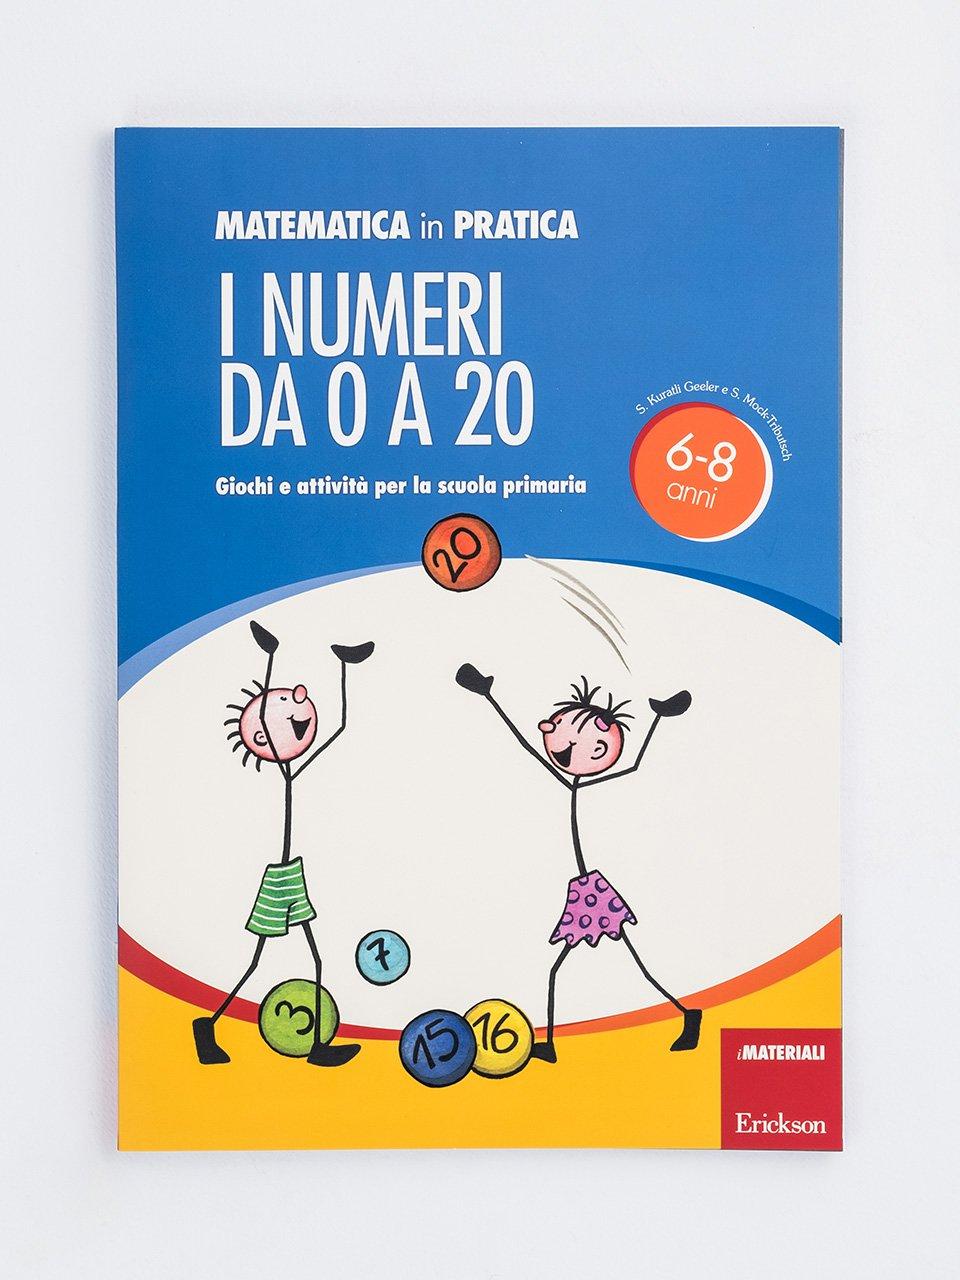 I numeri da 0 a 20 (Serie: Matematica in pratica) - Test ABCA - Abilità di calcolo aritmetico - Libri - Erickson